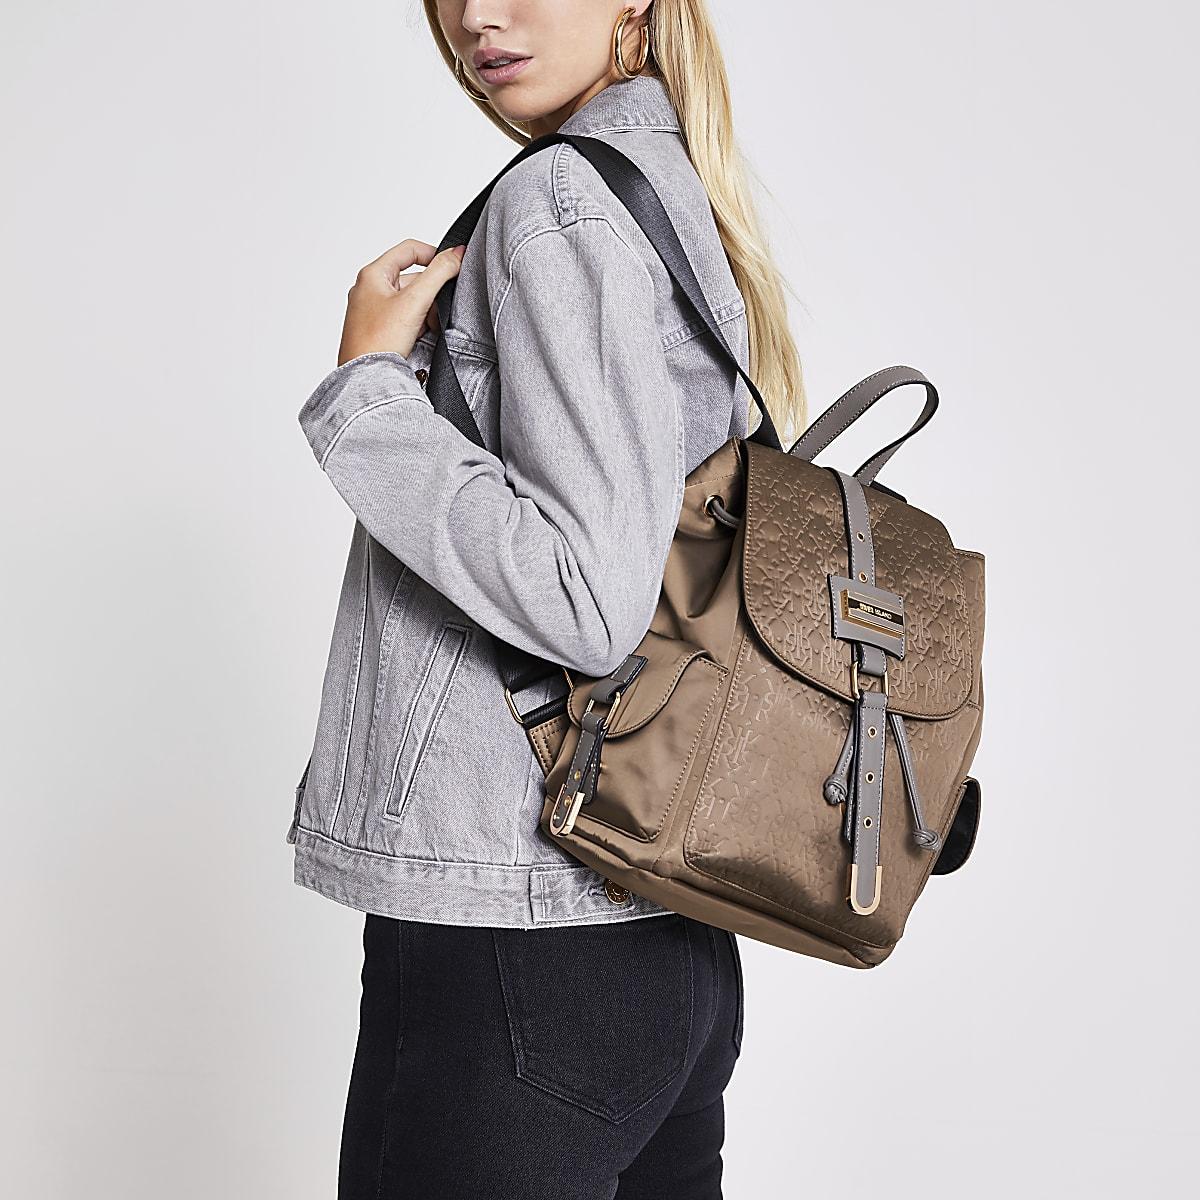 River Island handbag - brown backpack